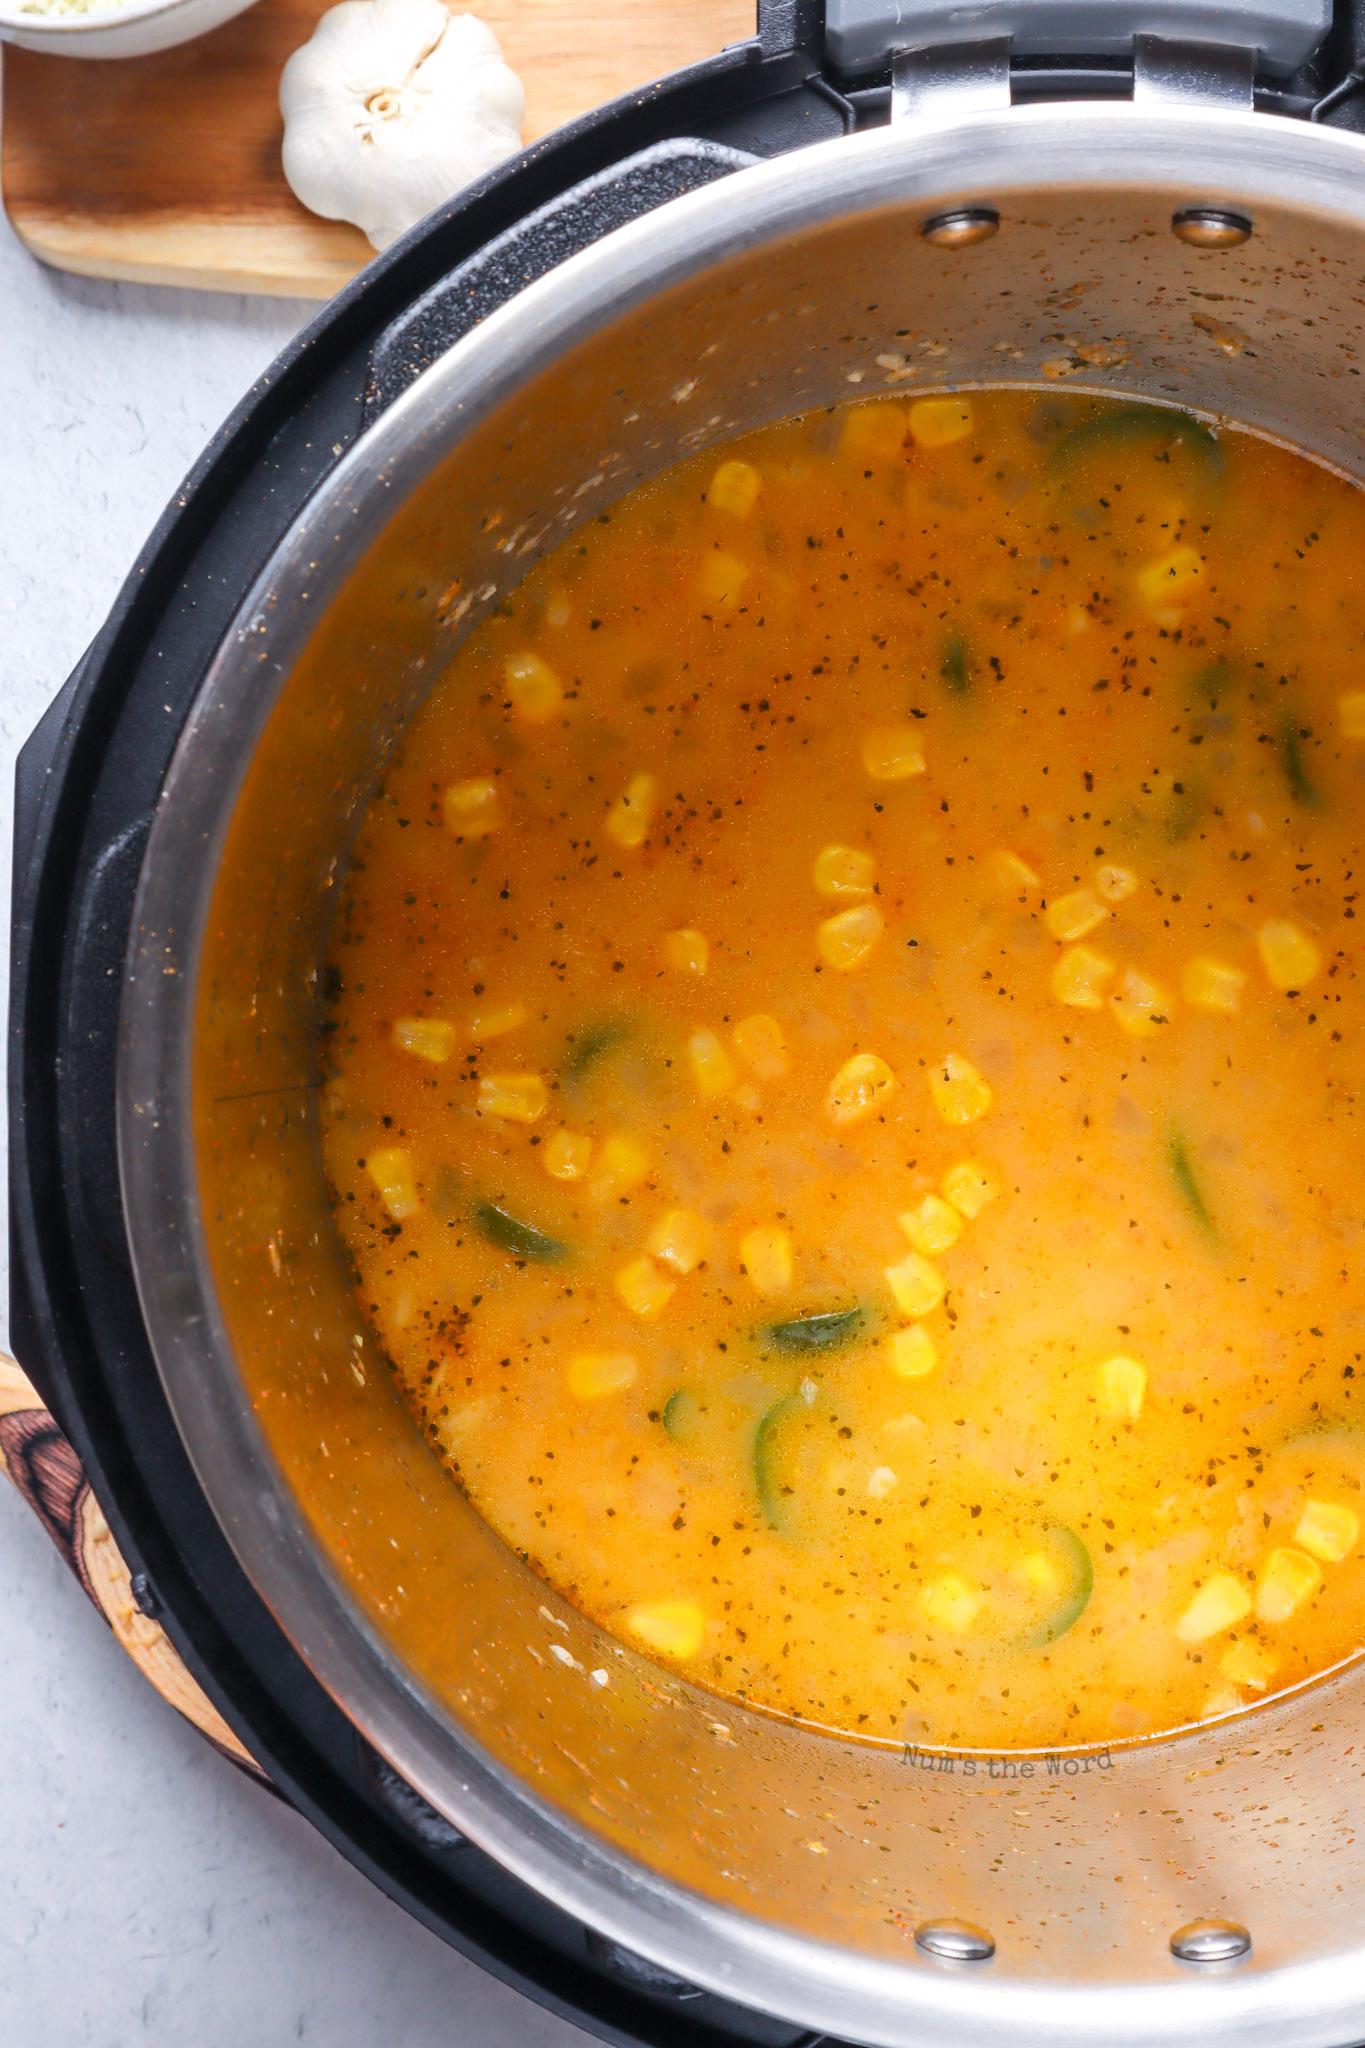 chicken broth added to corn mixture.